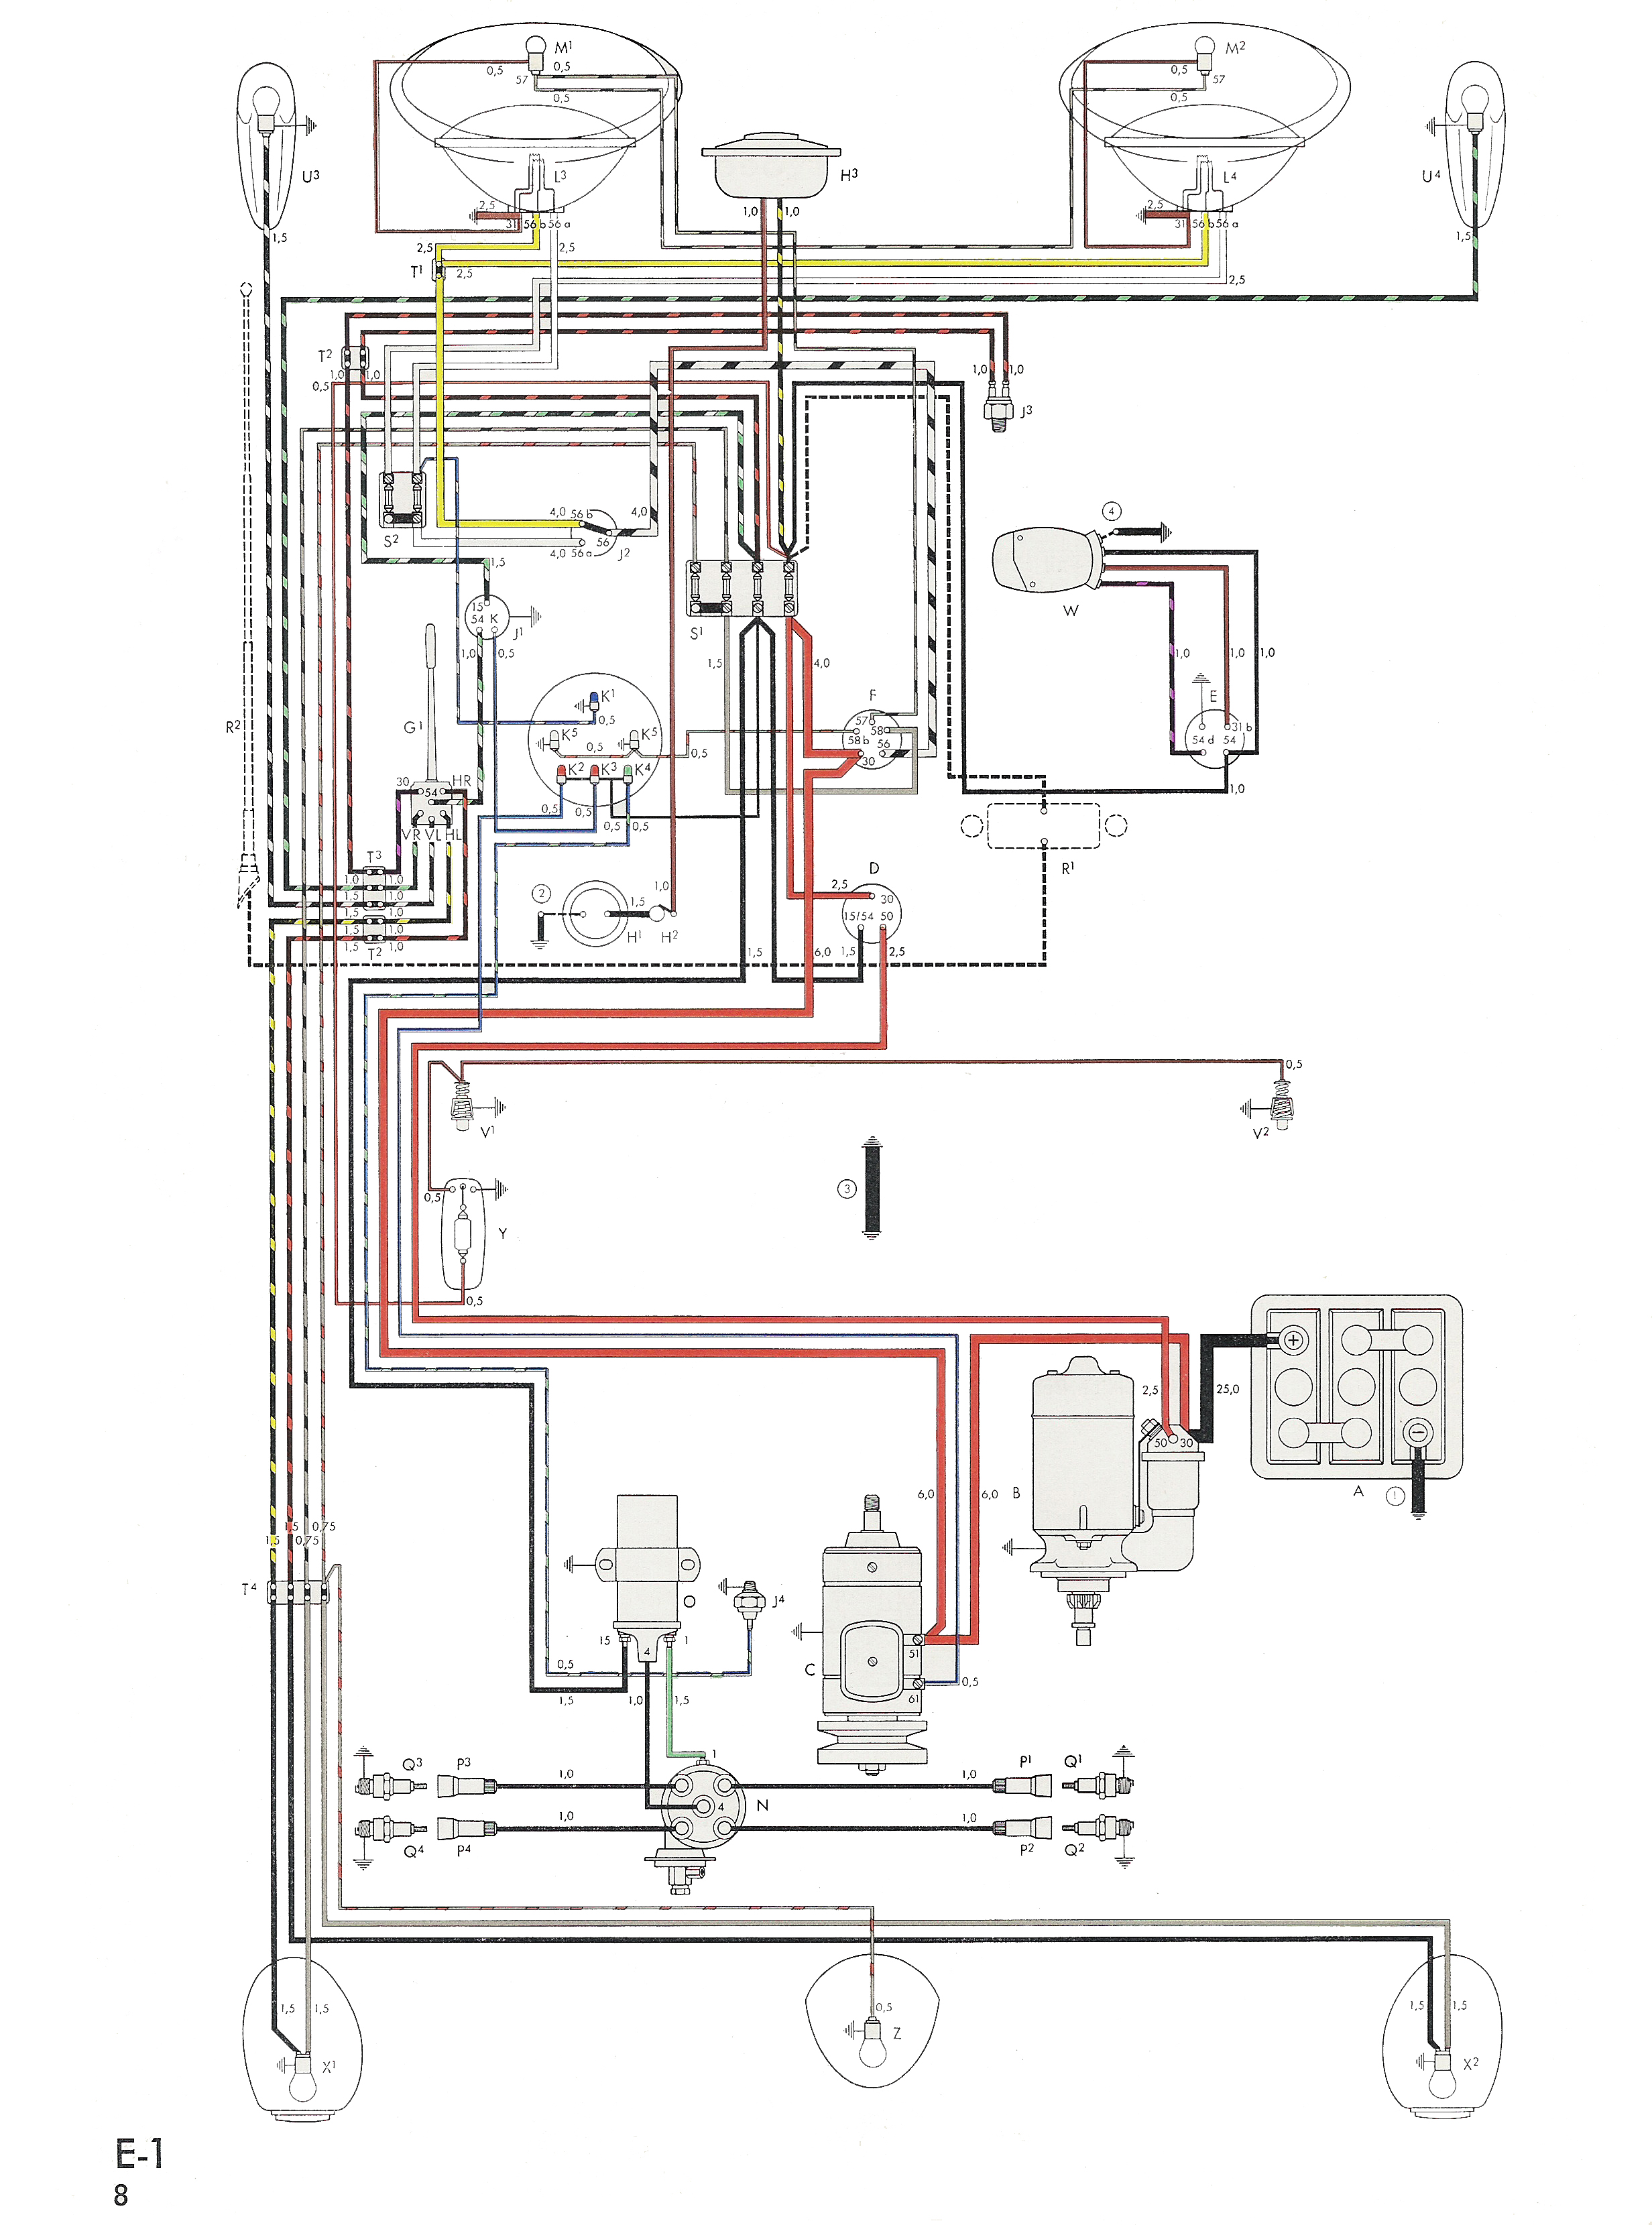 bug_58_USA_300dpi?resize\\\=665%2C896\\\&ssl\\\=1 74 vw super beetle wiring diagram wiring diagrams 1971 vw super beetle wiring diagram at bayanpartner.co